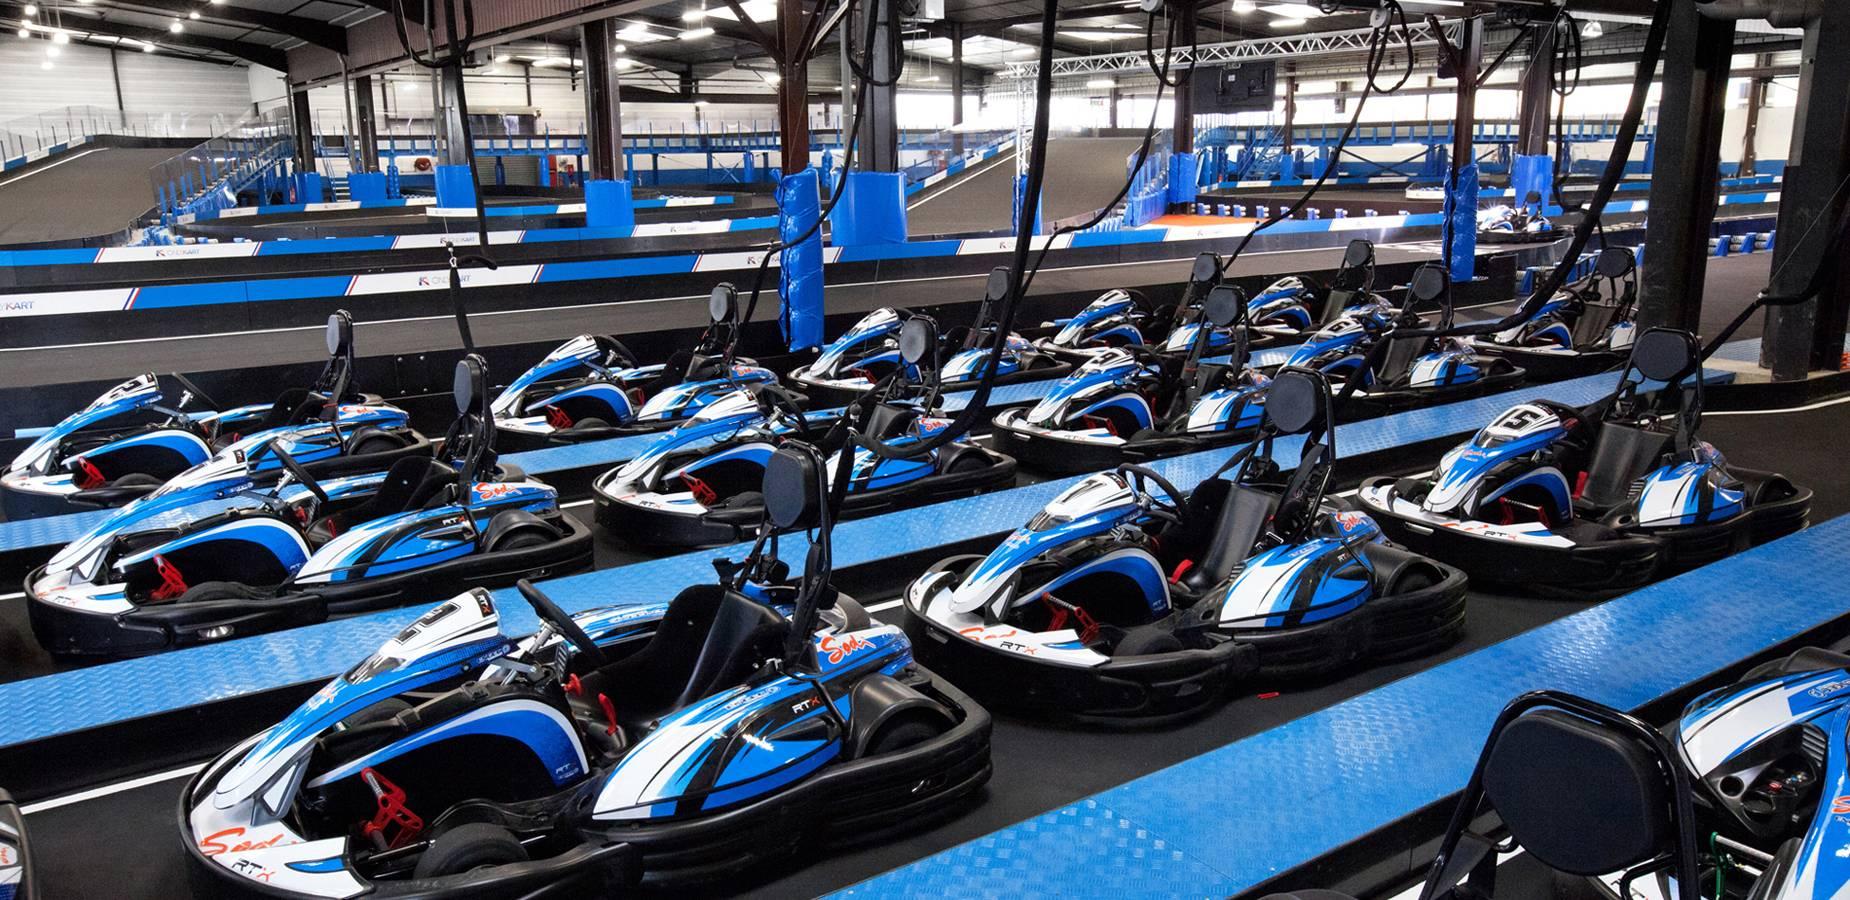 karting indoor près de lyon